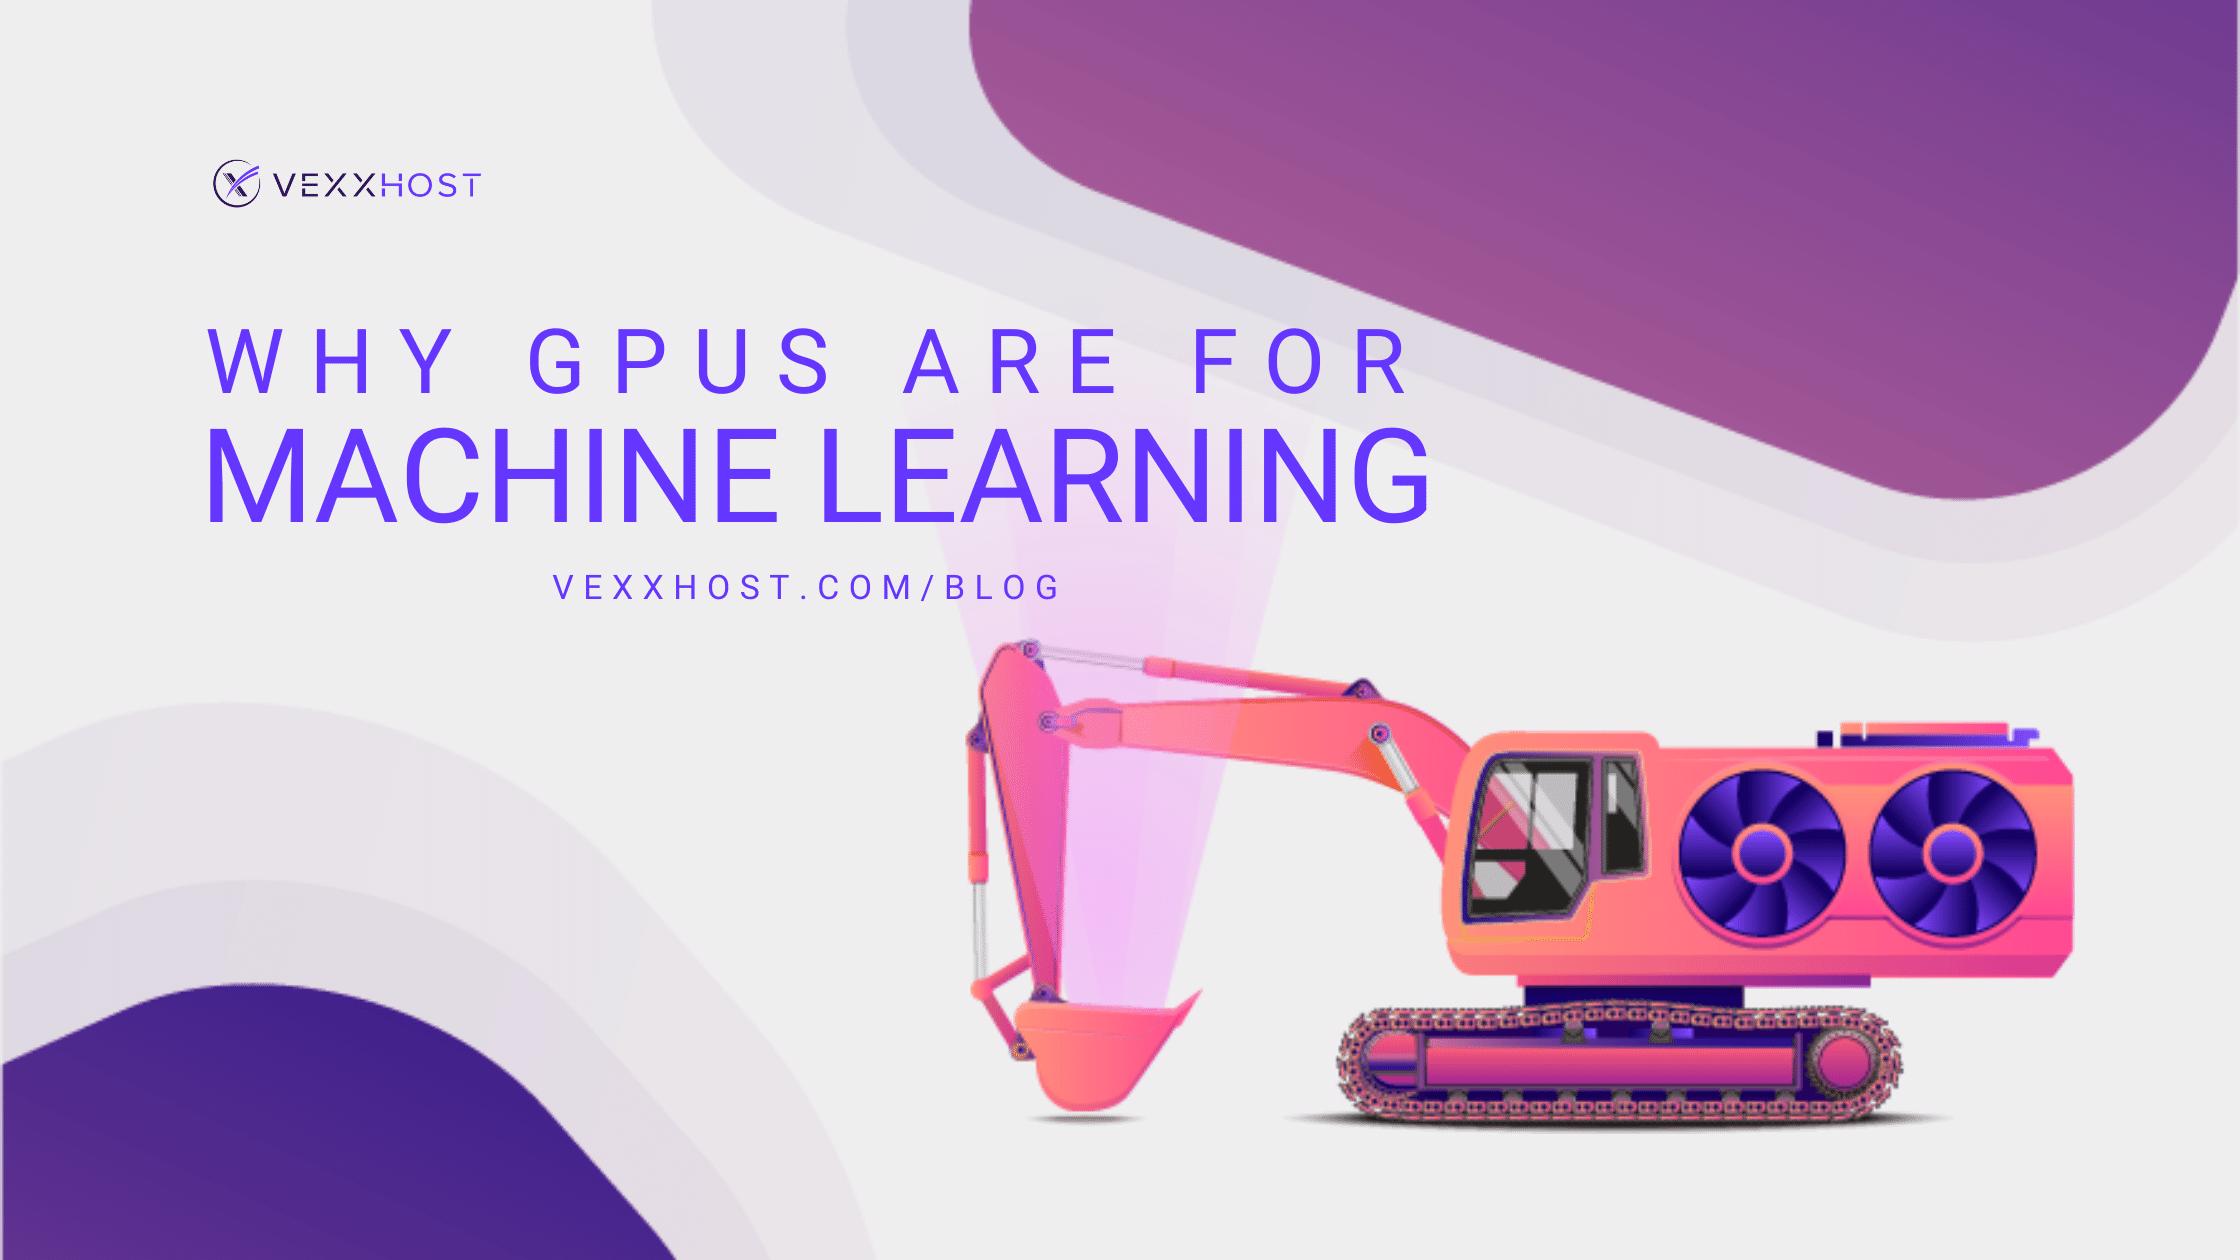 gpu-machine-learning-vexxhost-blog-header